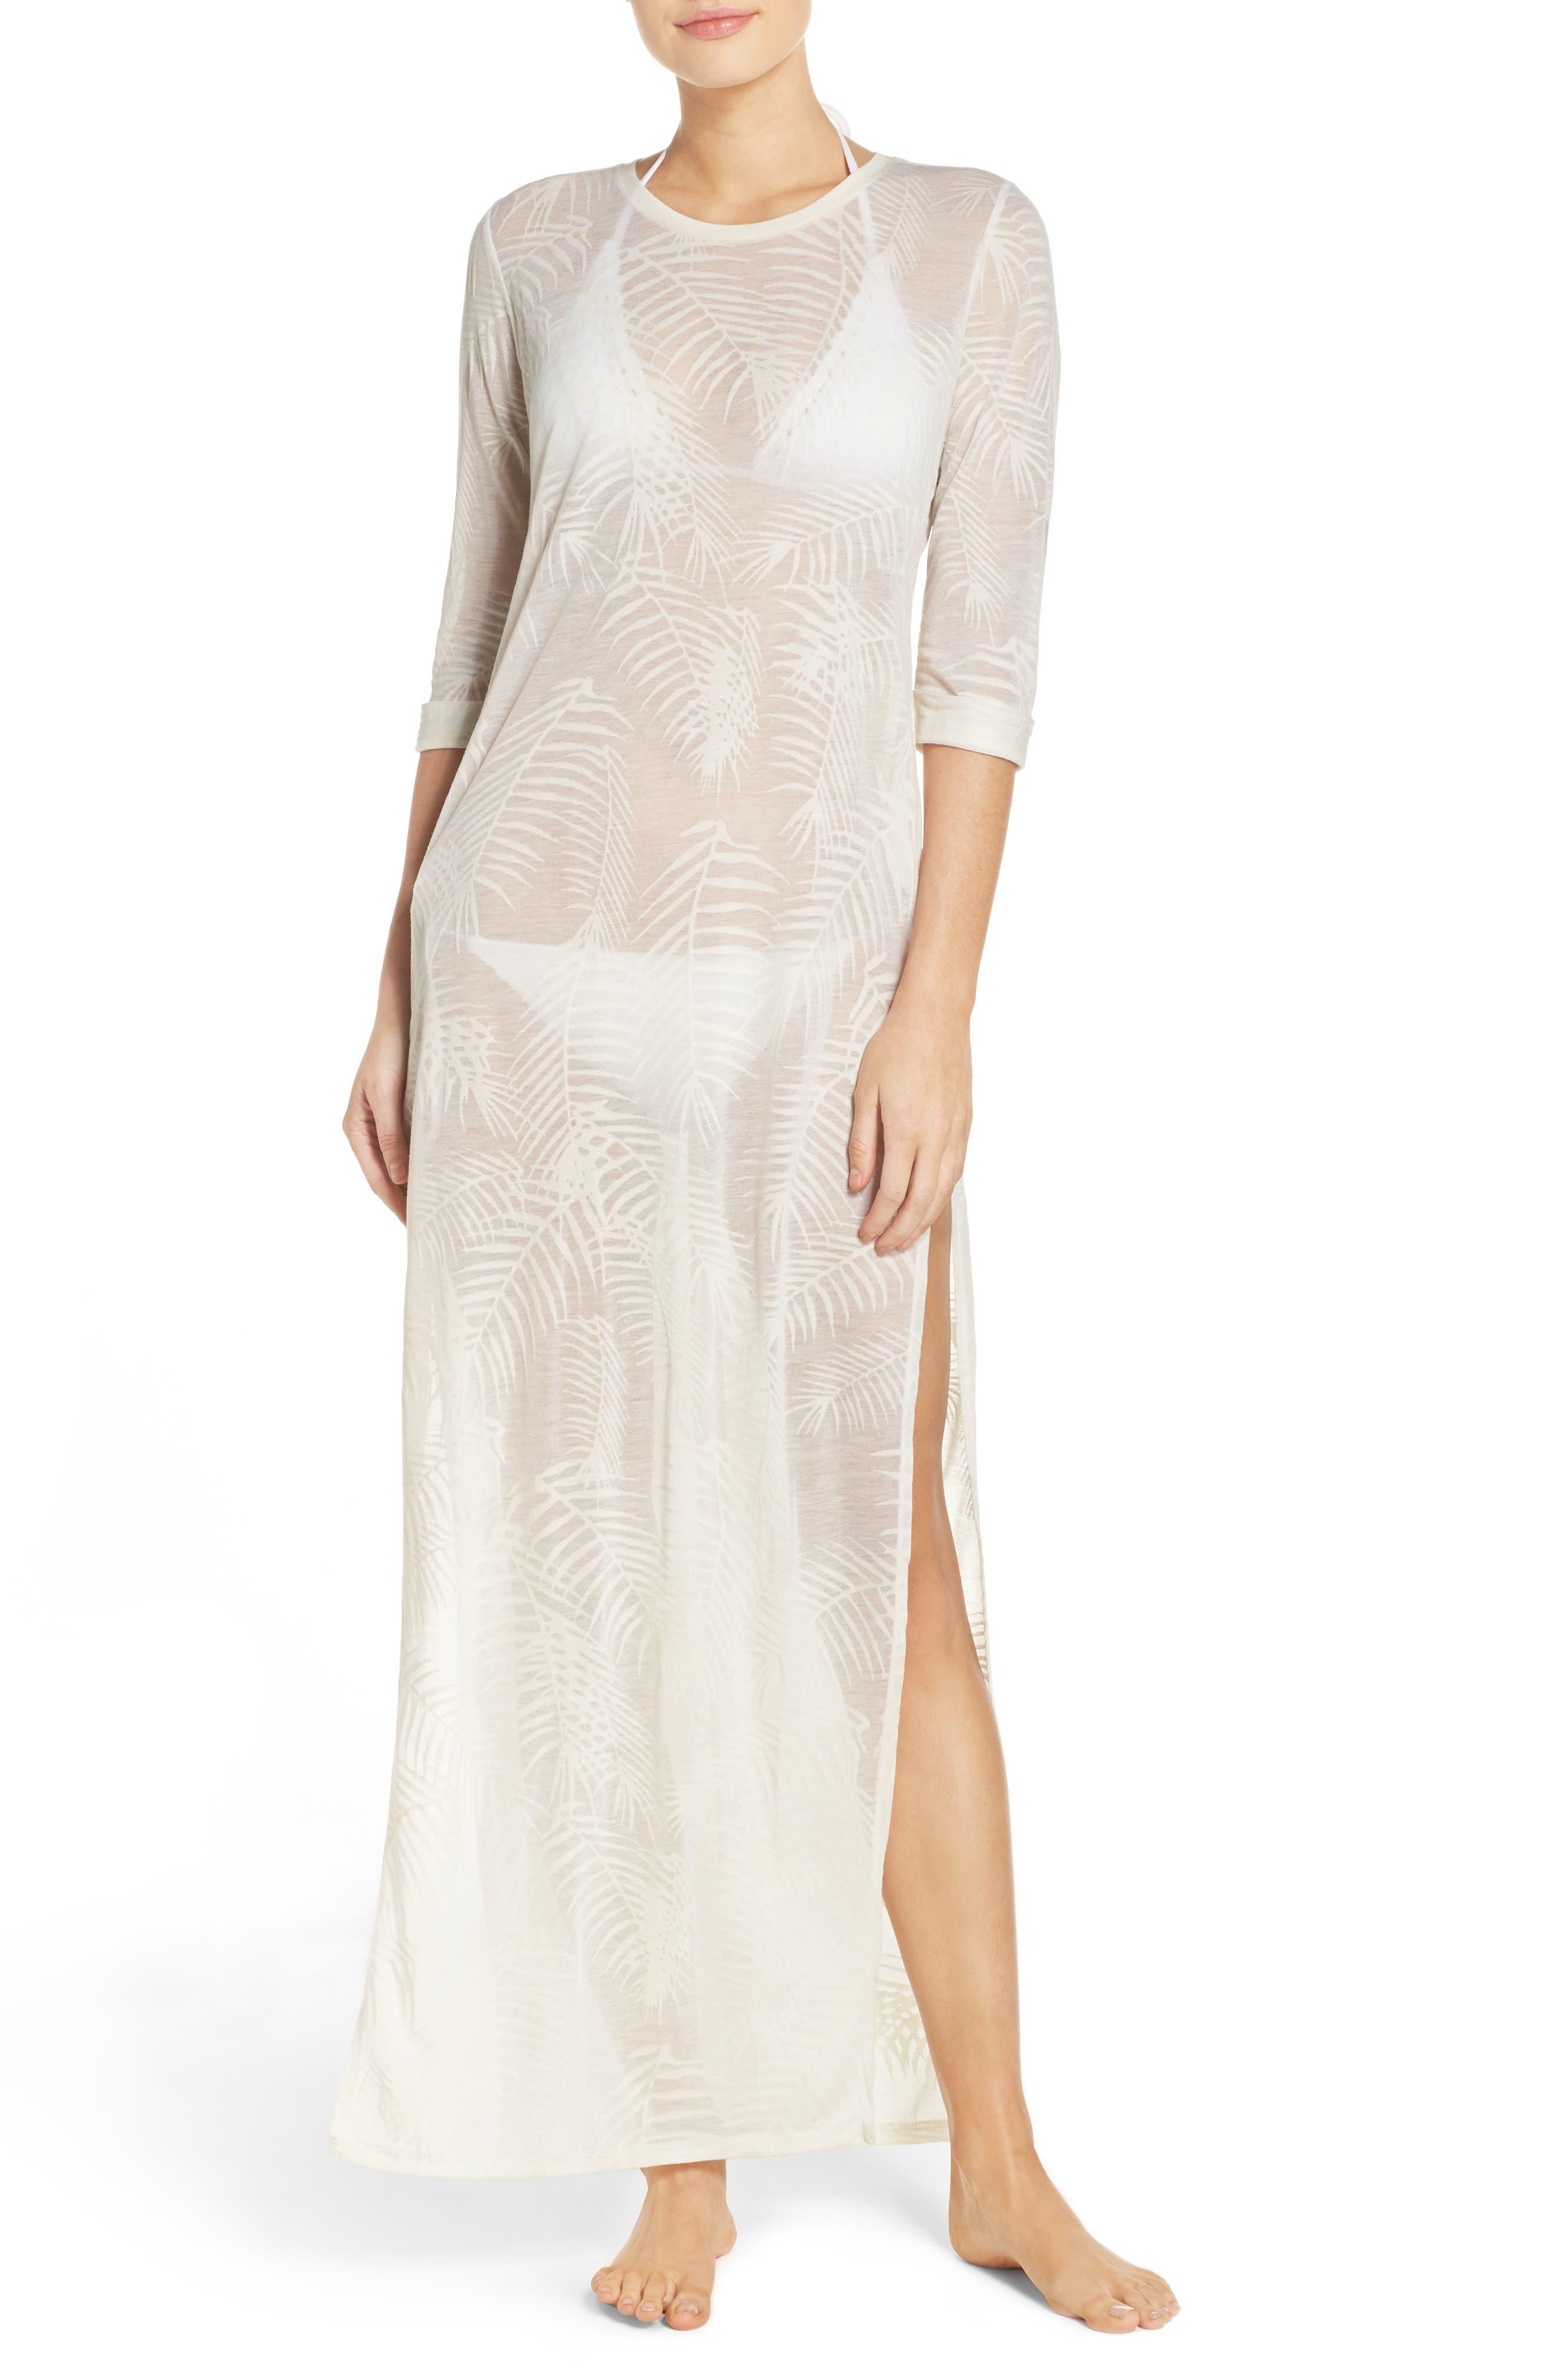 Finley Cover-Up Maxi Dress,                             Main thumbnail 1, color,                             100